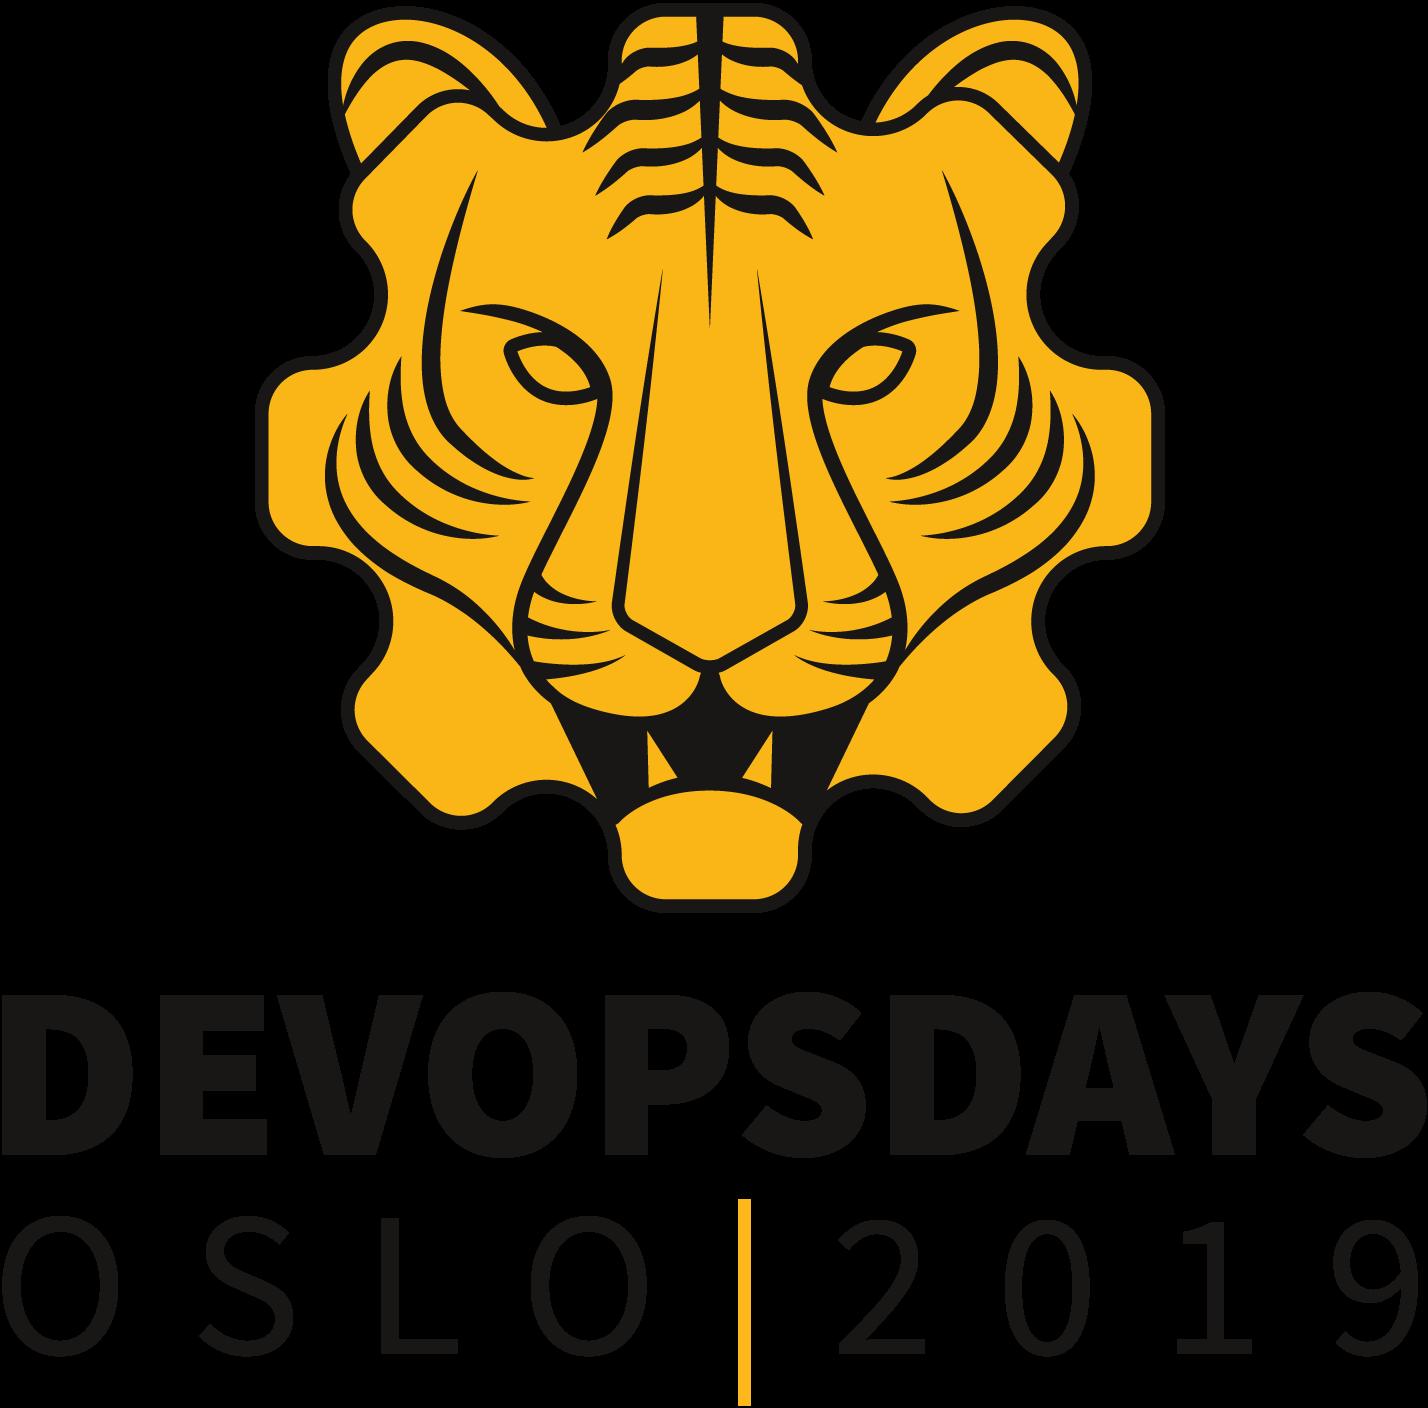 DevOpsDays Oslo 2019